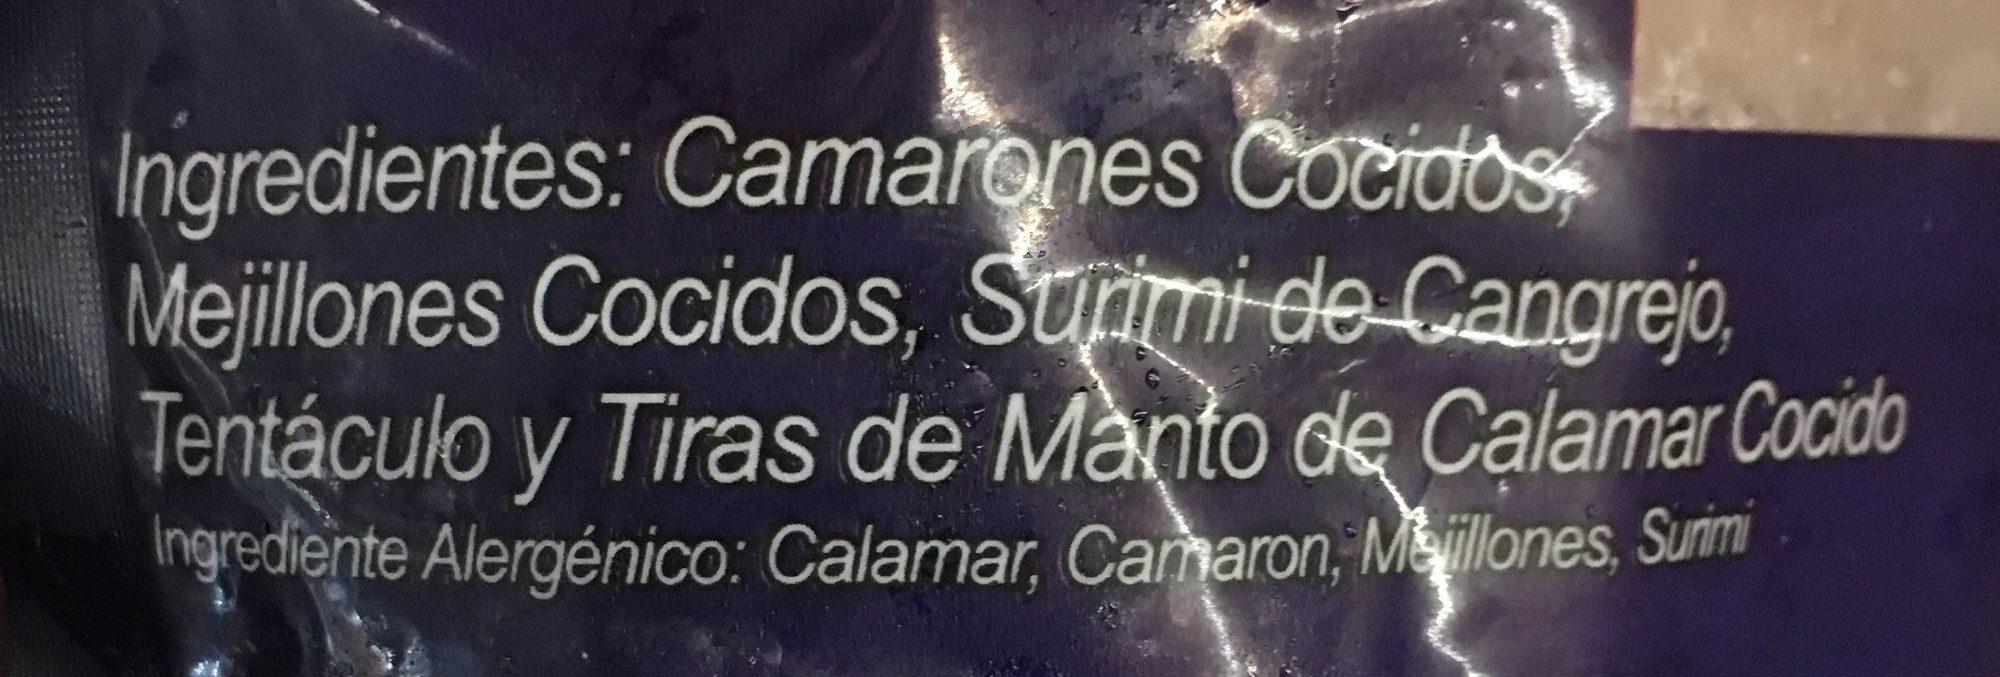 Mariscada, Premium sea food, bonisimo del mar, - Ingredients - es